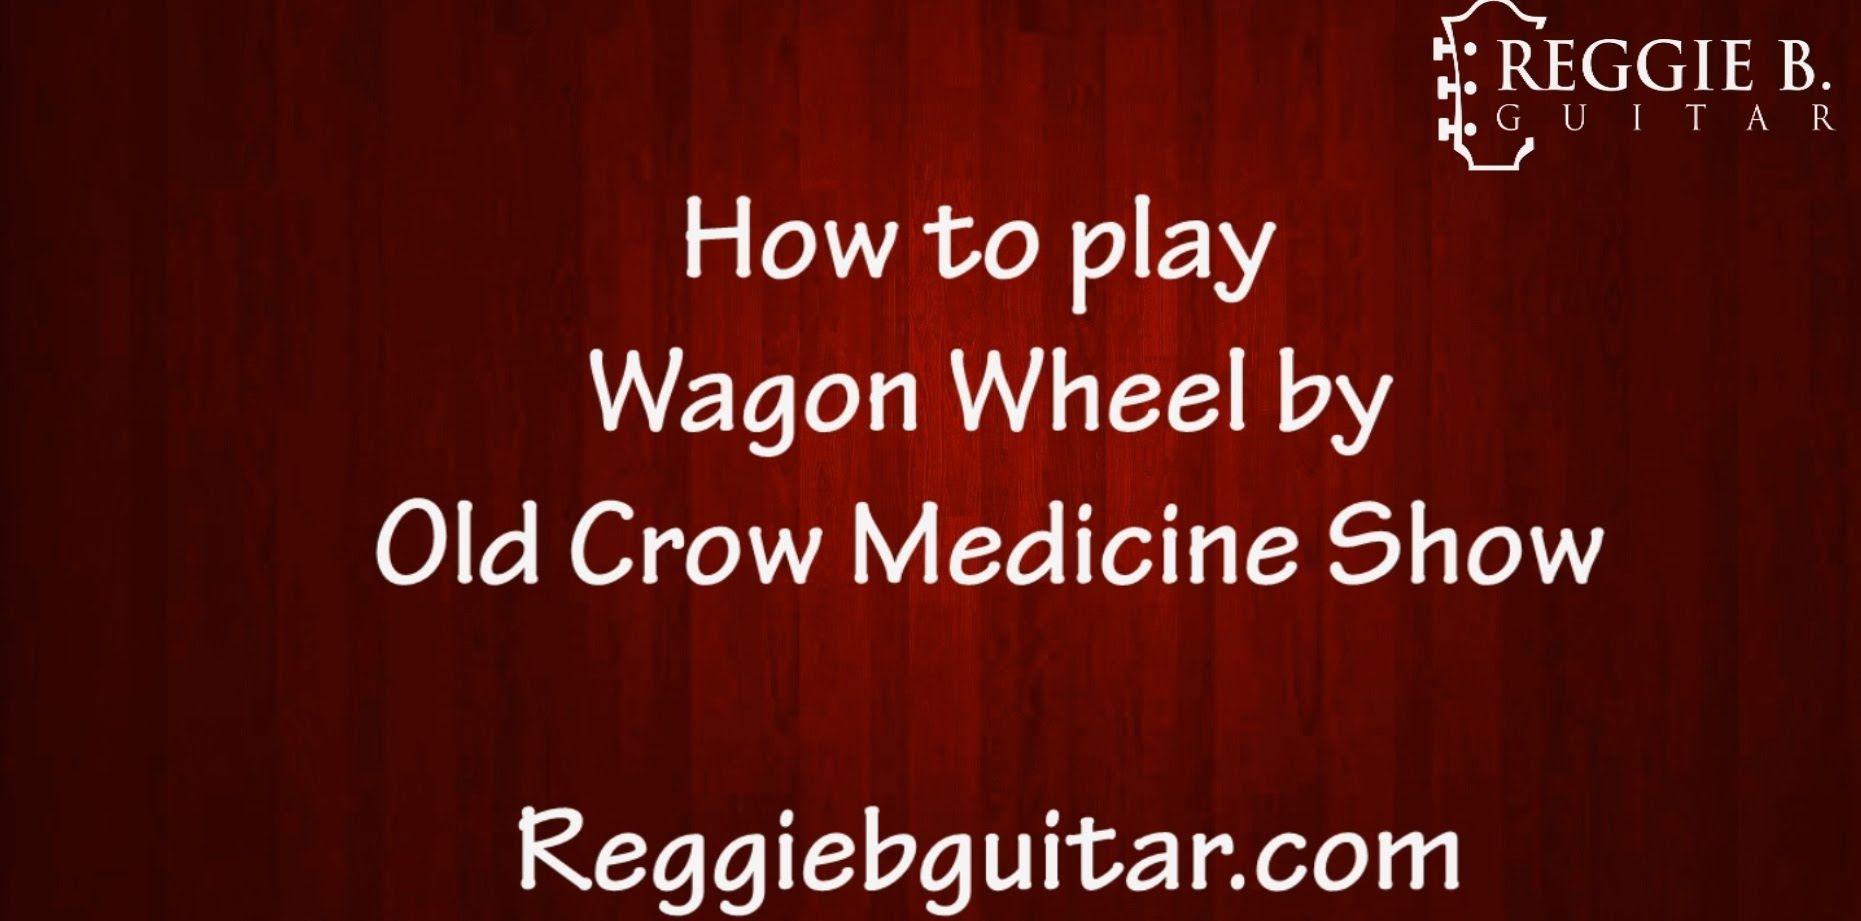 Wagon Wheel Old Crow Medicine Show Darius Rucker Guitar Lesson